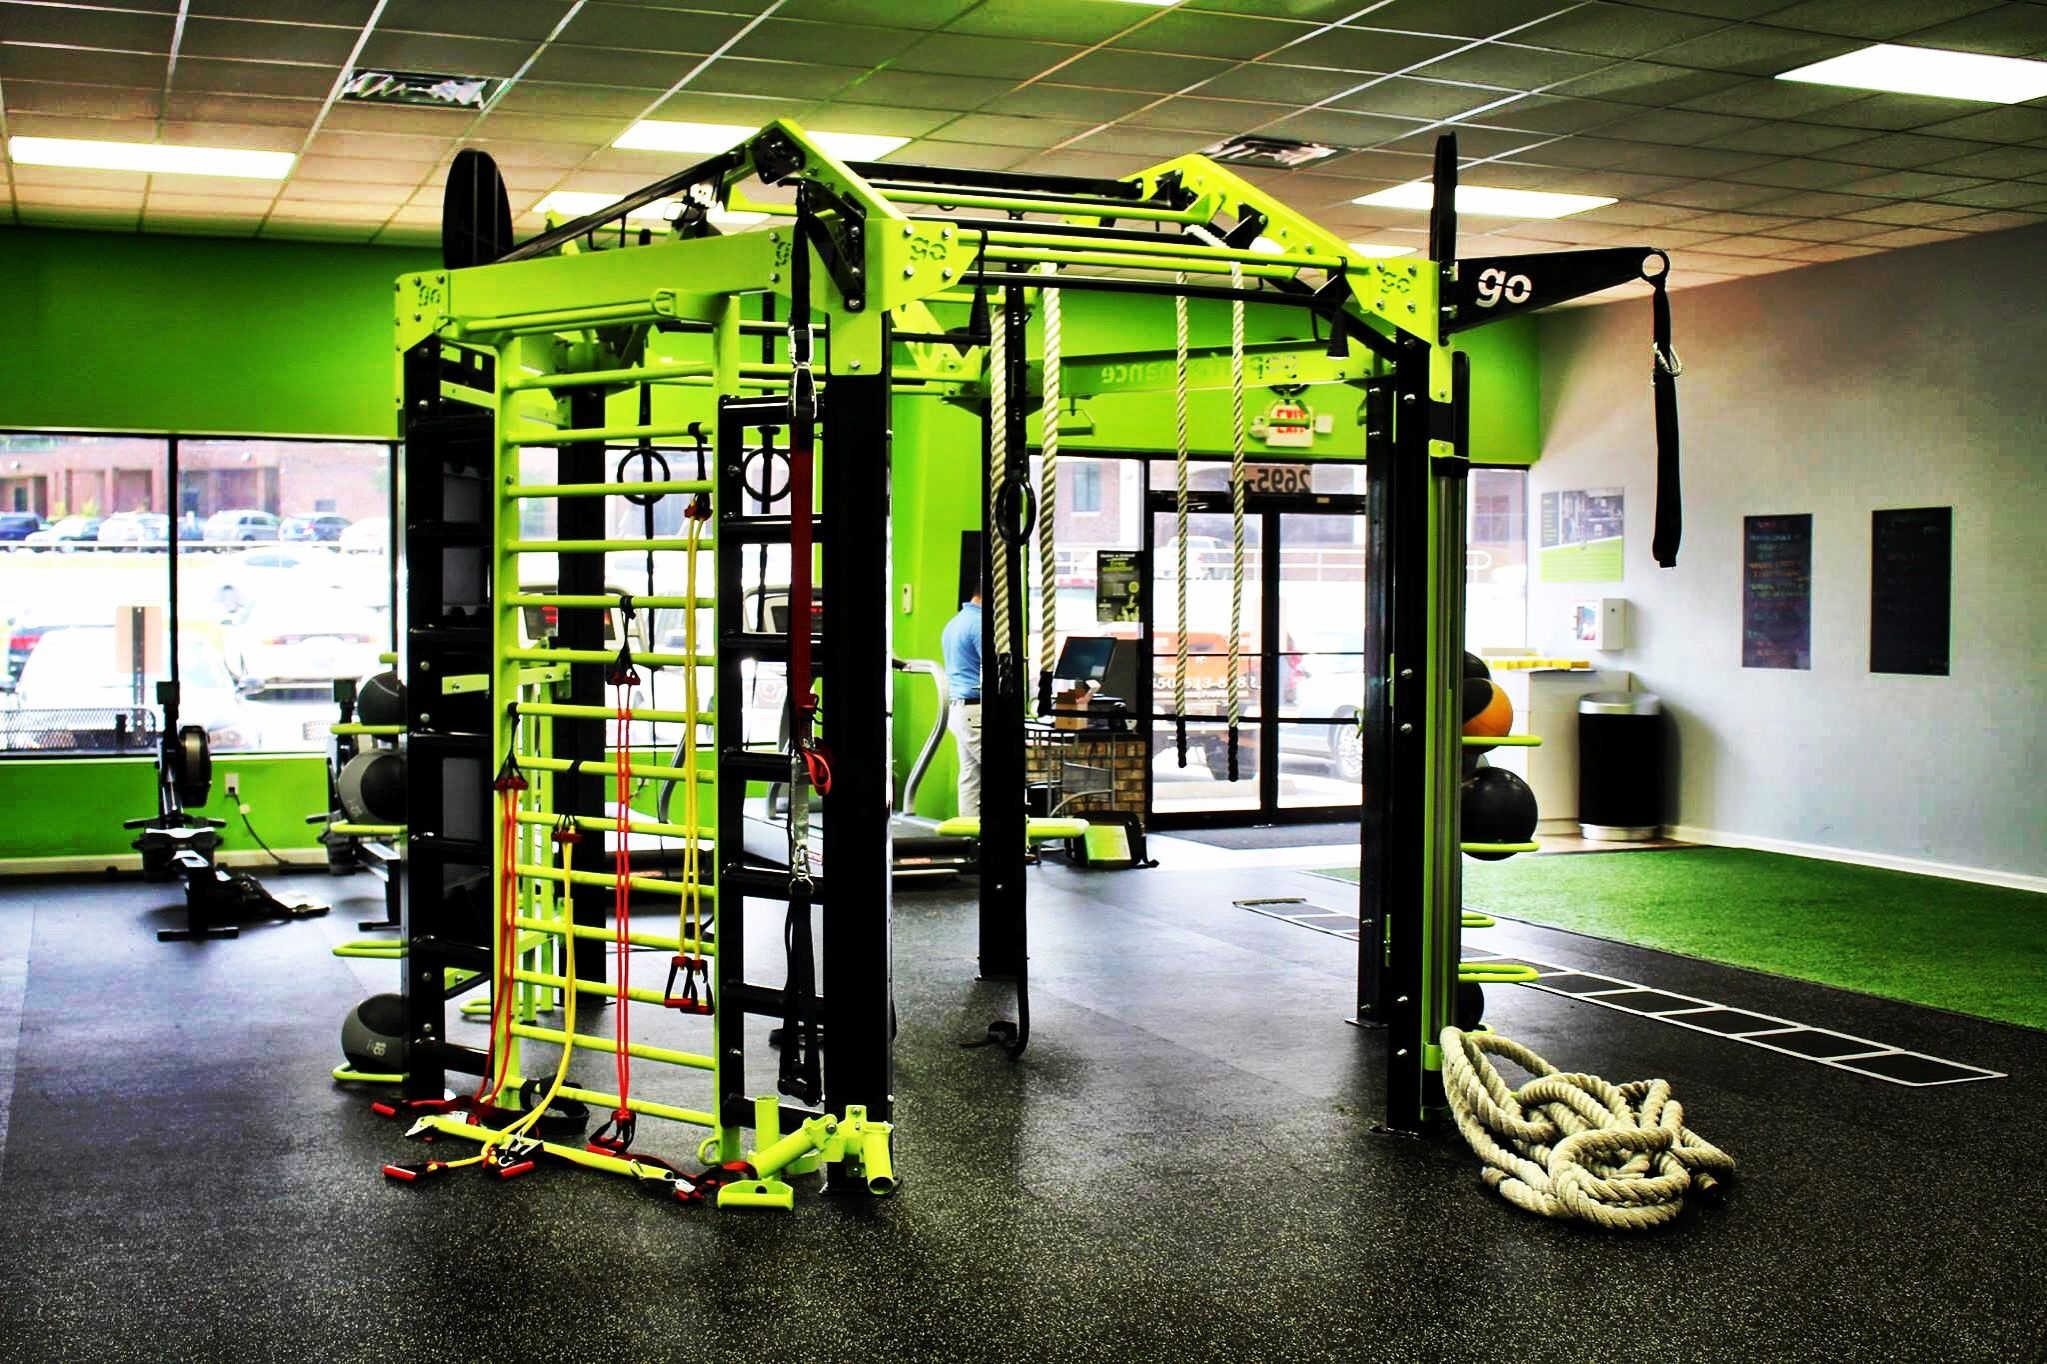 Fresh Premier Gym Tallahassee